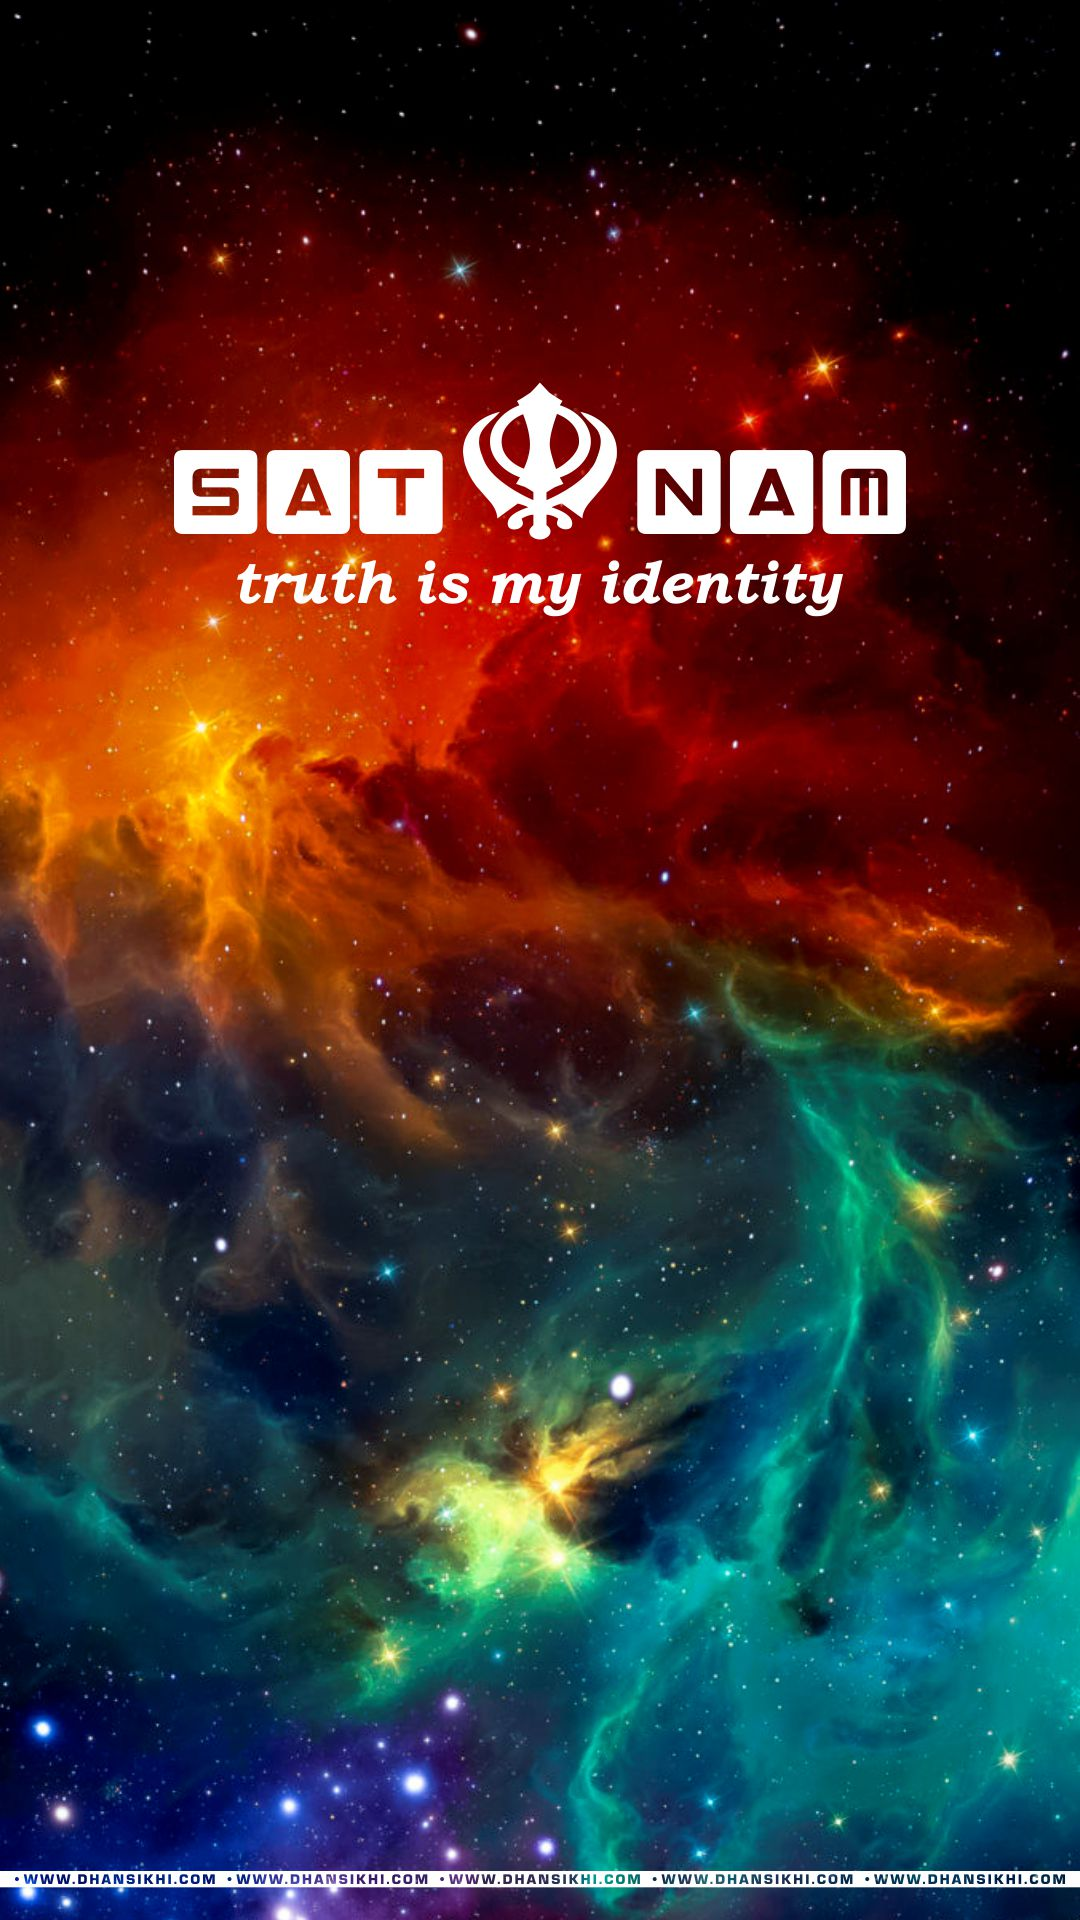 Mobile Wallpaper - Satnam Truth My Identity